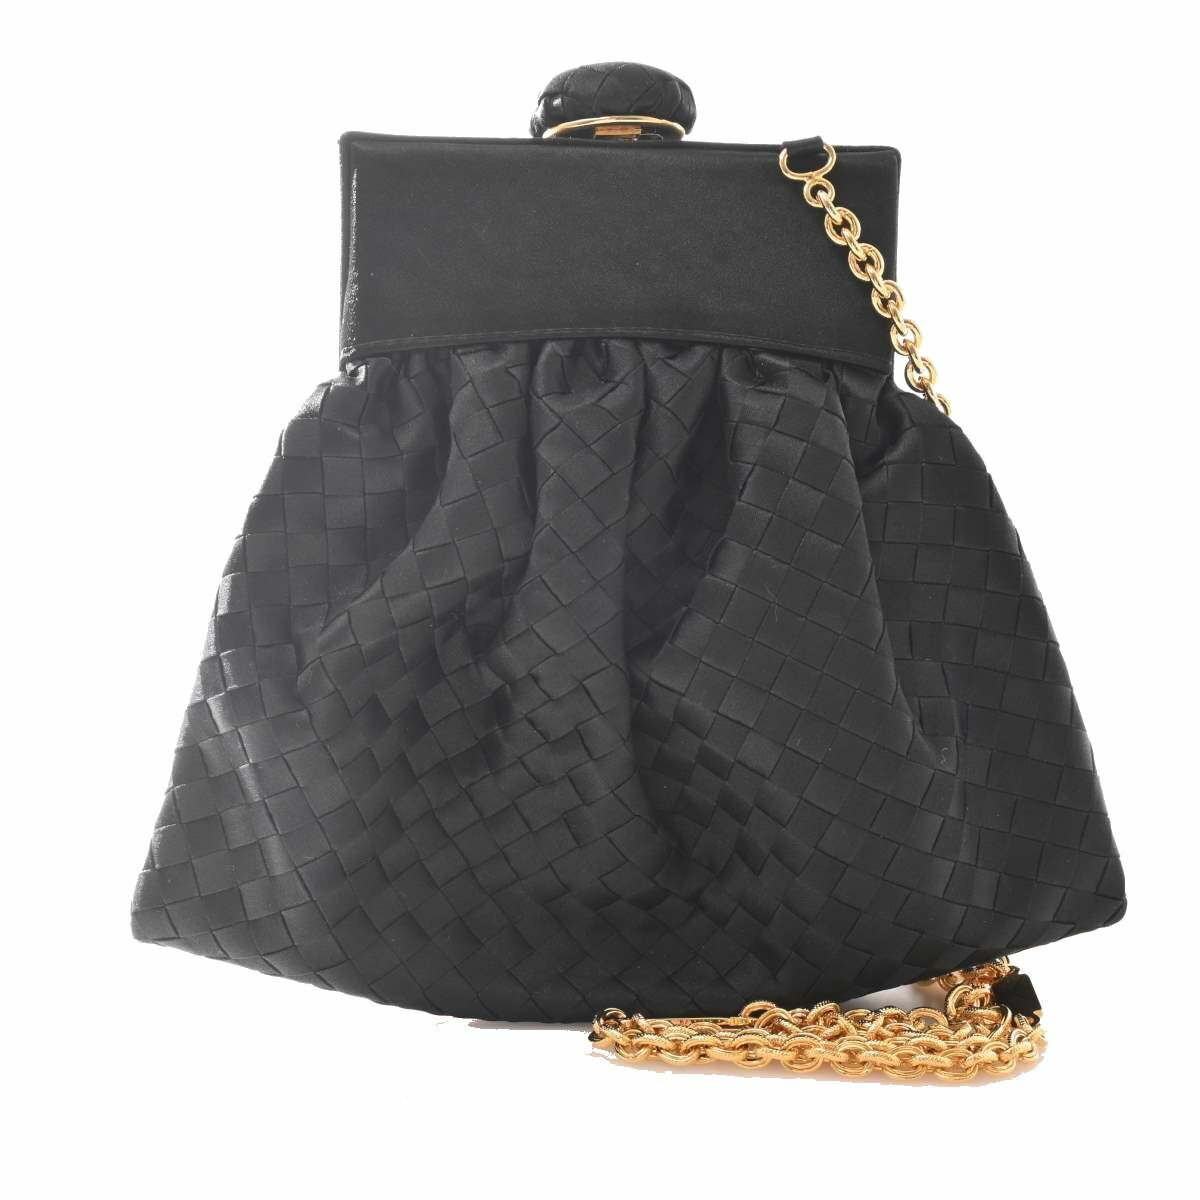 Bottega Veneta Intrecciato Satin Gamaguchi Chain Shoulder Bag Leather Black